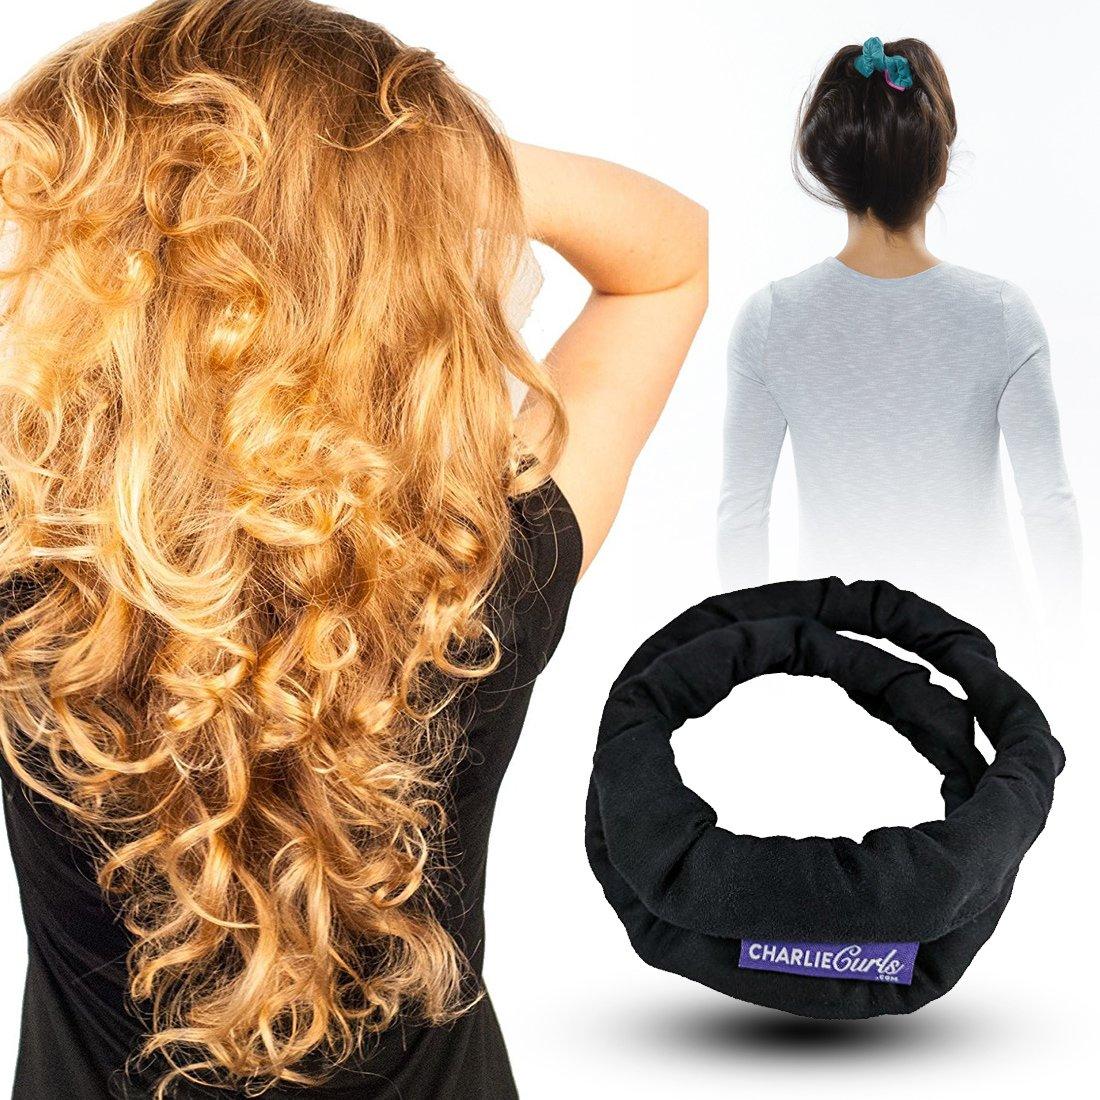 CharlieCurls: No Heat, On The Go Hair Curler (Black) 2018